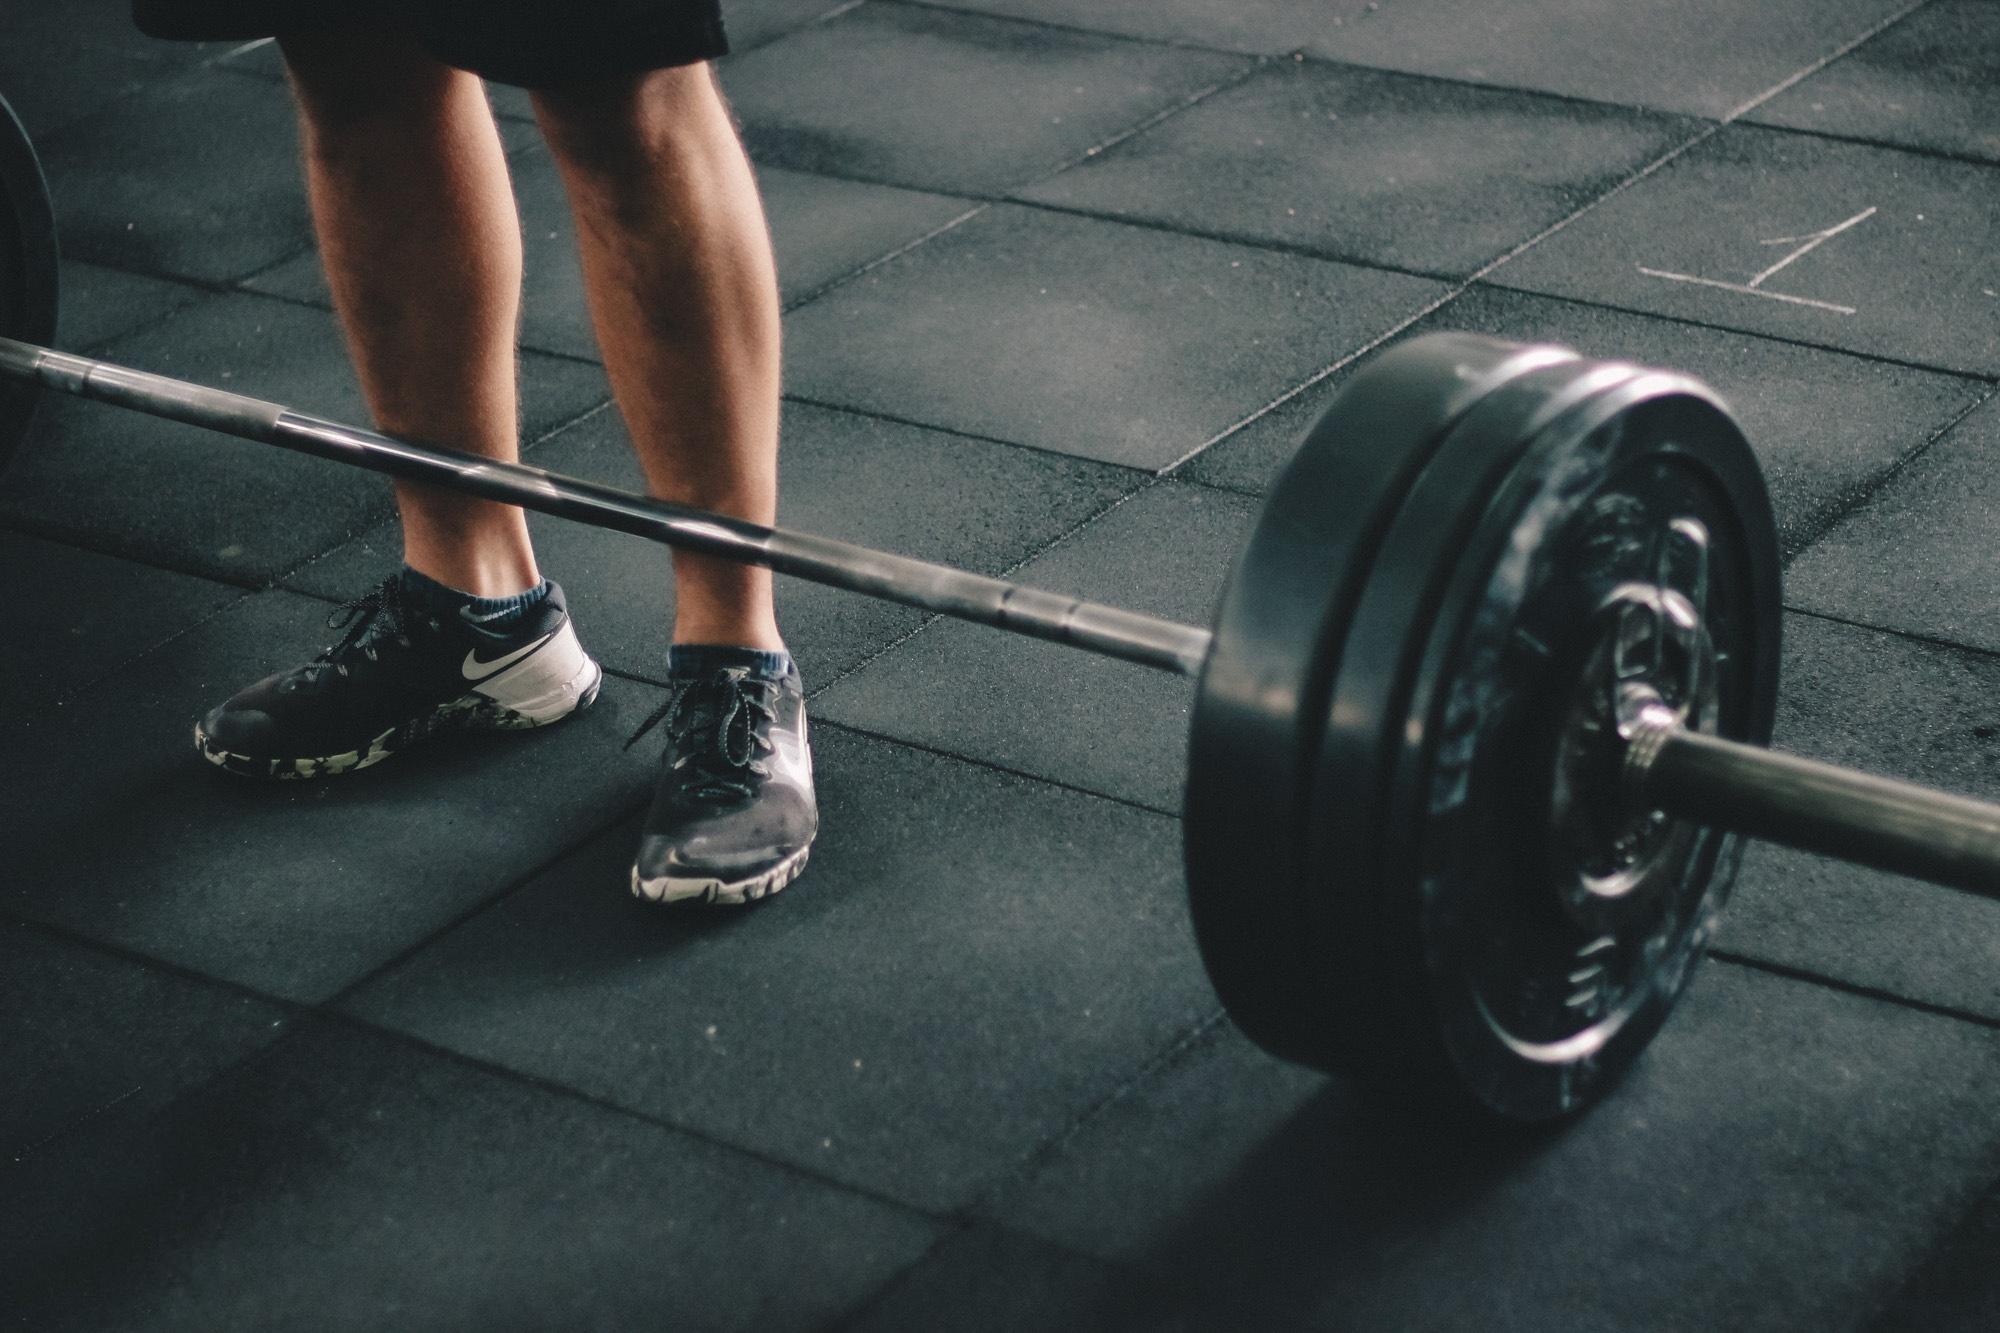 adult athlete barbell body bodybuilder bodybuilding brawny crossfit dark dumbbell exercise exercise equipment fitness footwear gym